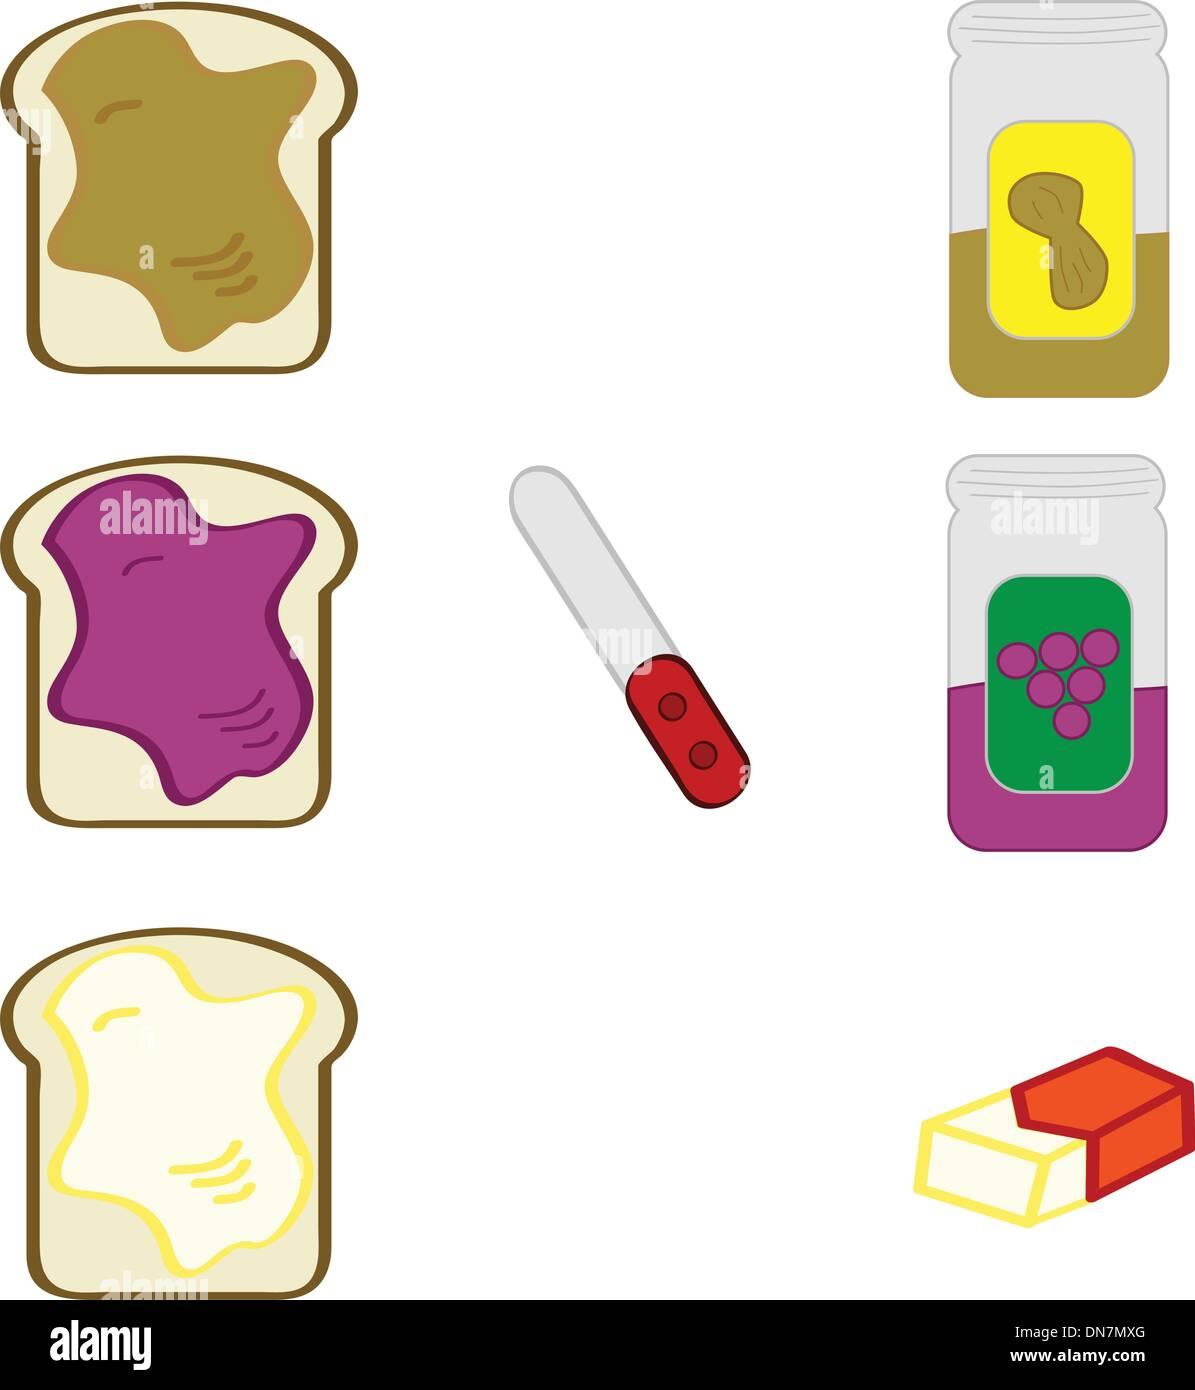 Bread spreads - Stock Image